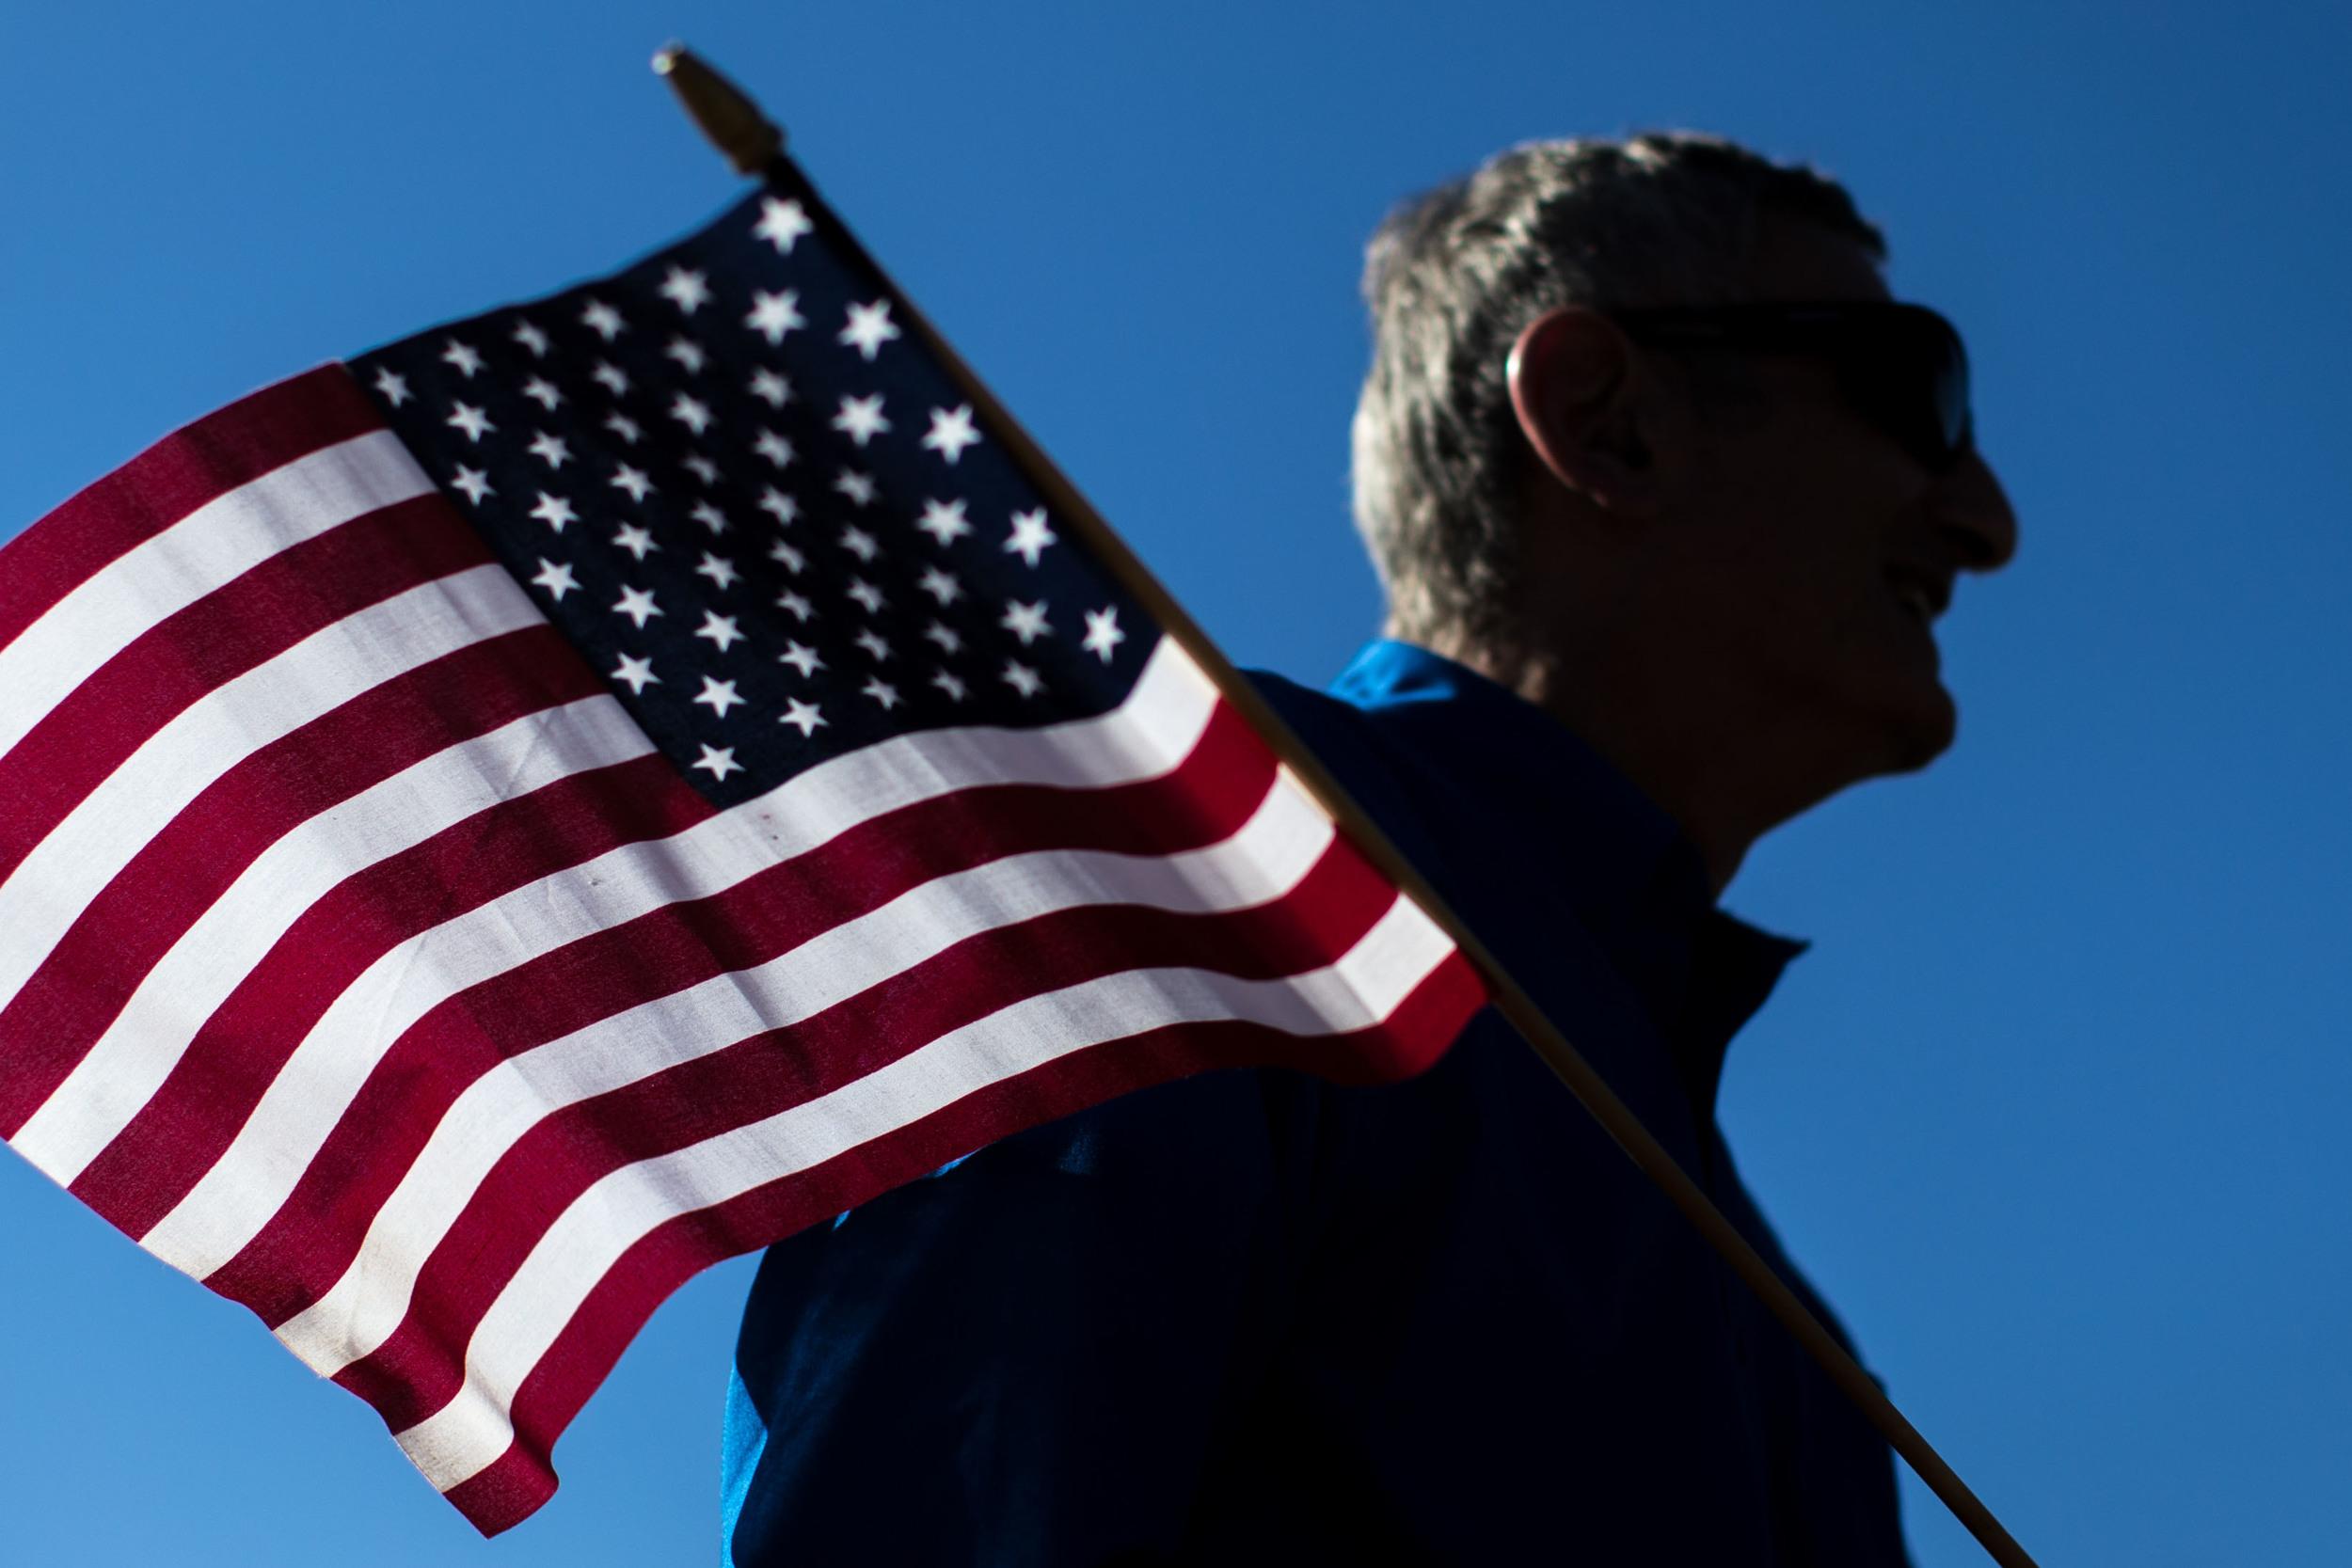 Nov. 11, 2015 - Marietta, Ga, U.S - GEORGE ESSAFF holds a flag during a Veterans Day parade. (Credit Image: © Branden Camp via ZUMA Wire)